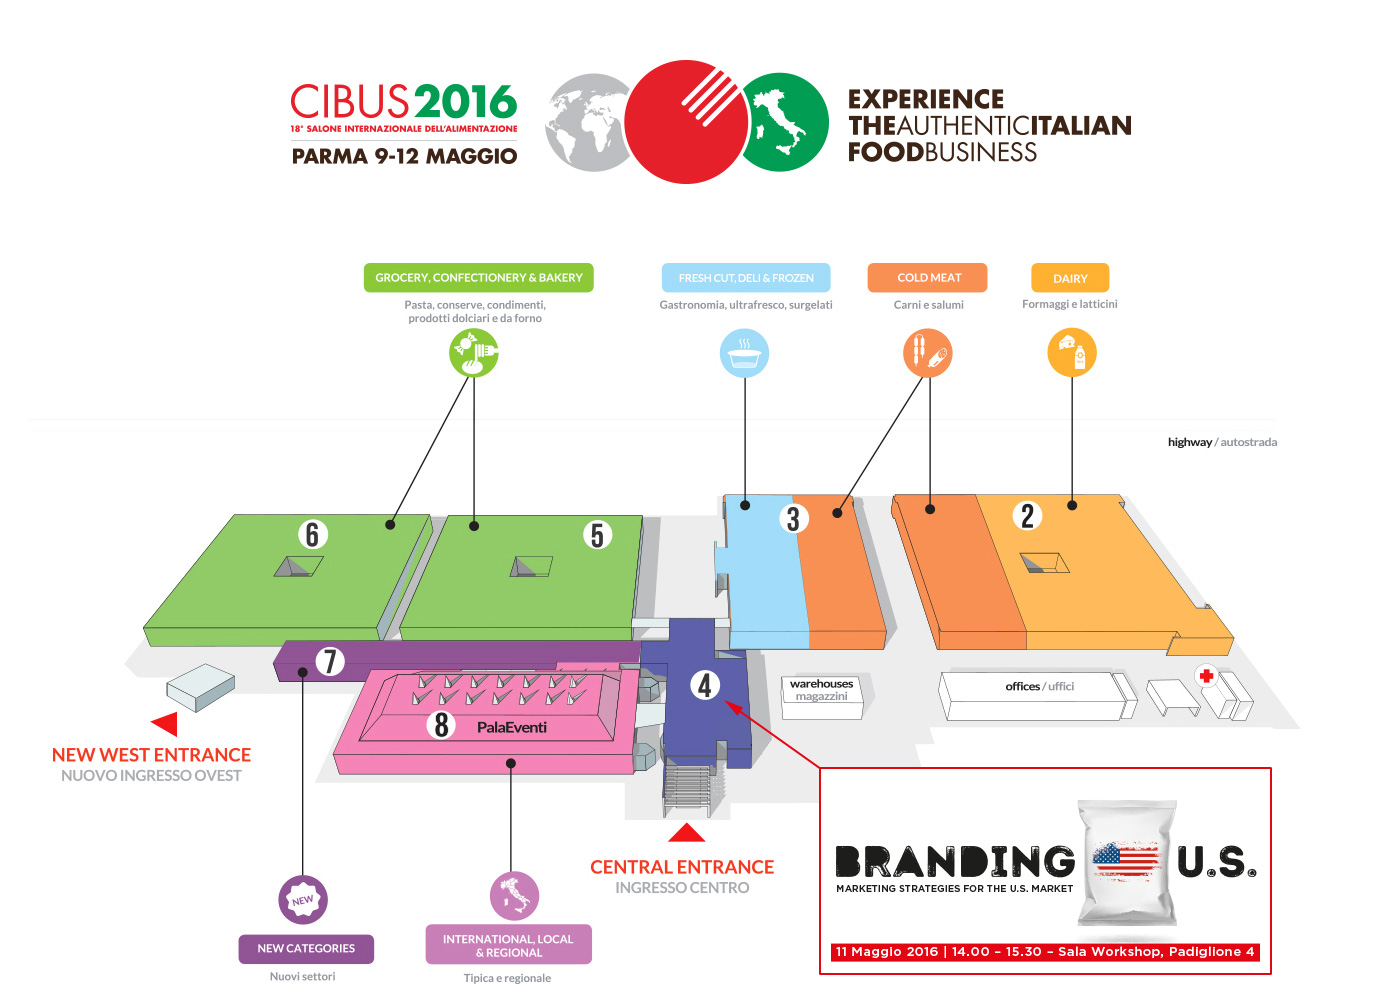 http://www.branding-us.com/wp-content/uploads/2015/12/Cibus-Branding-US-map20162-1.jpg